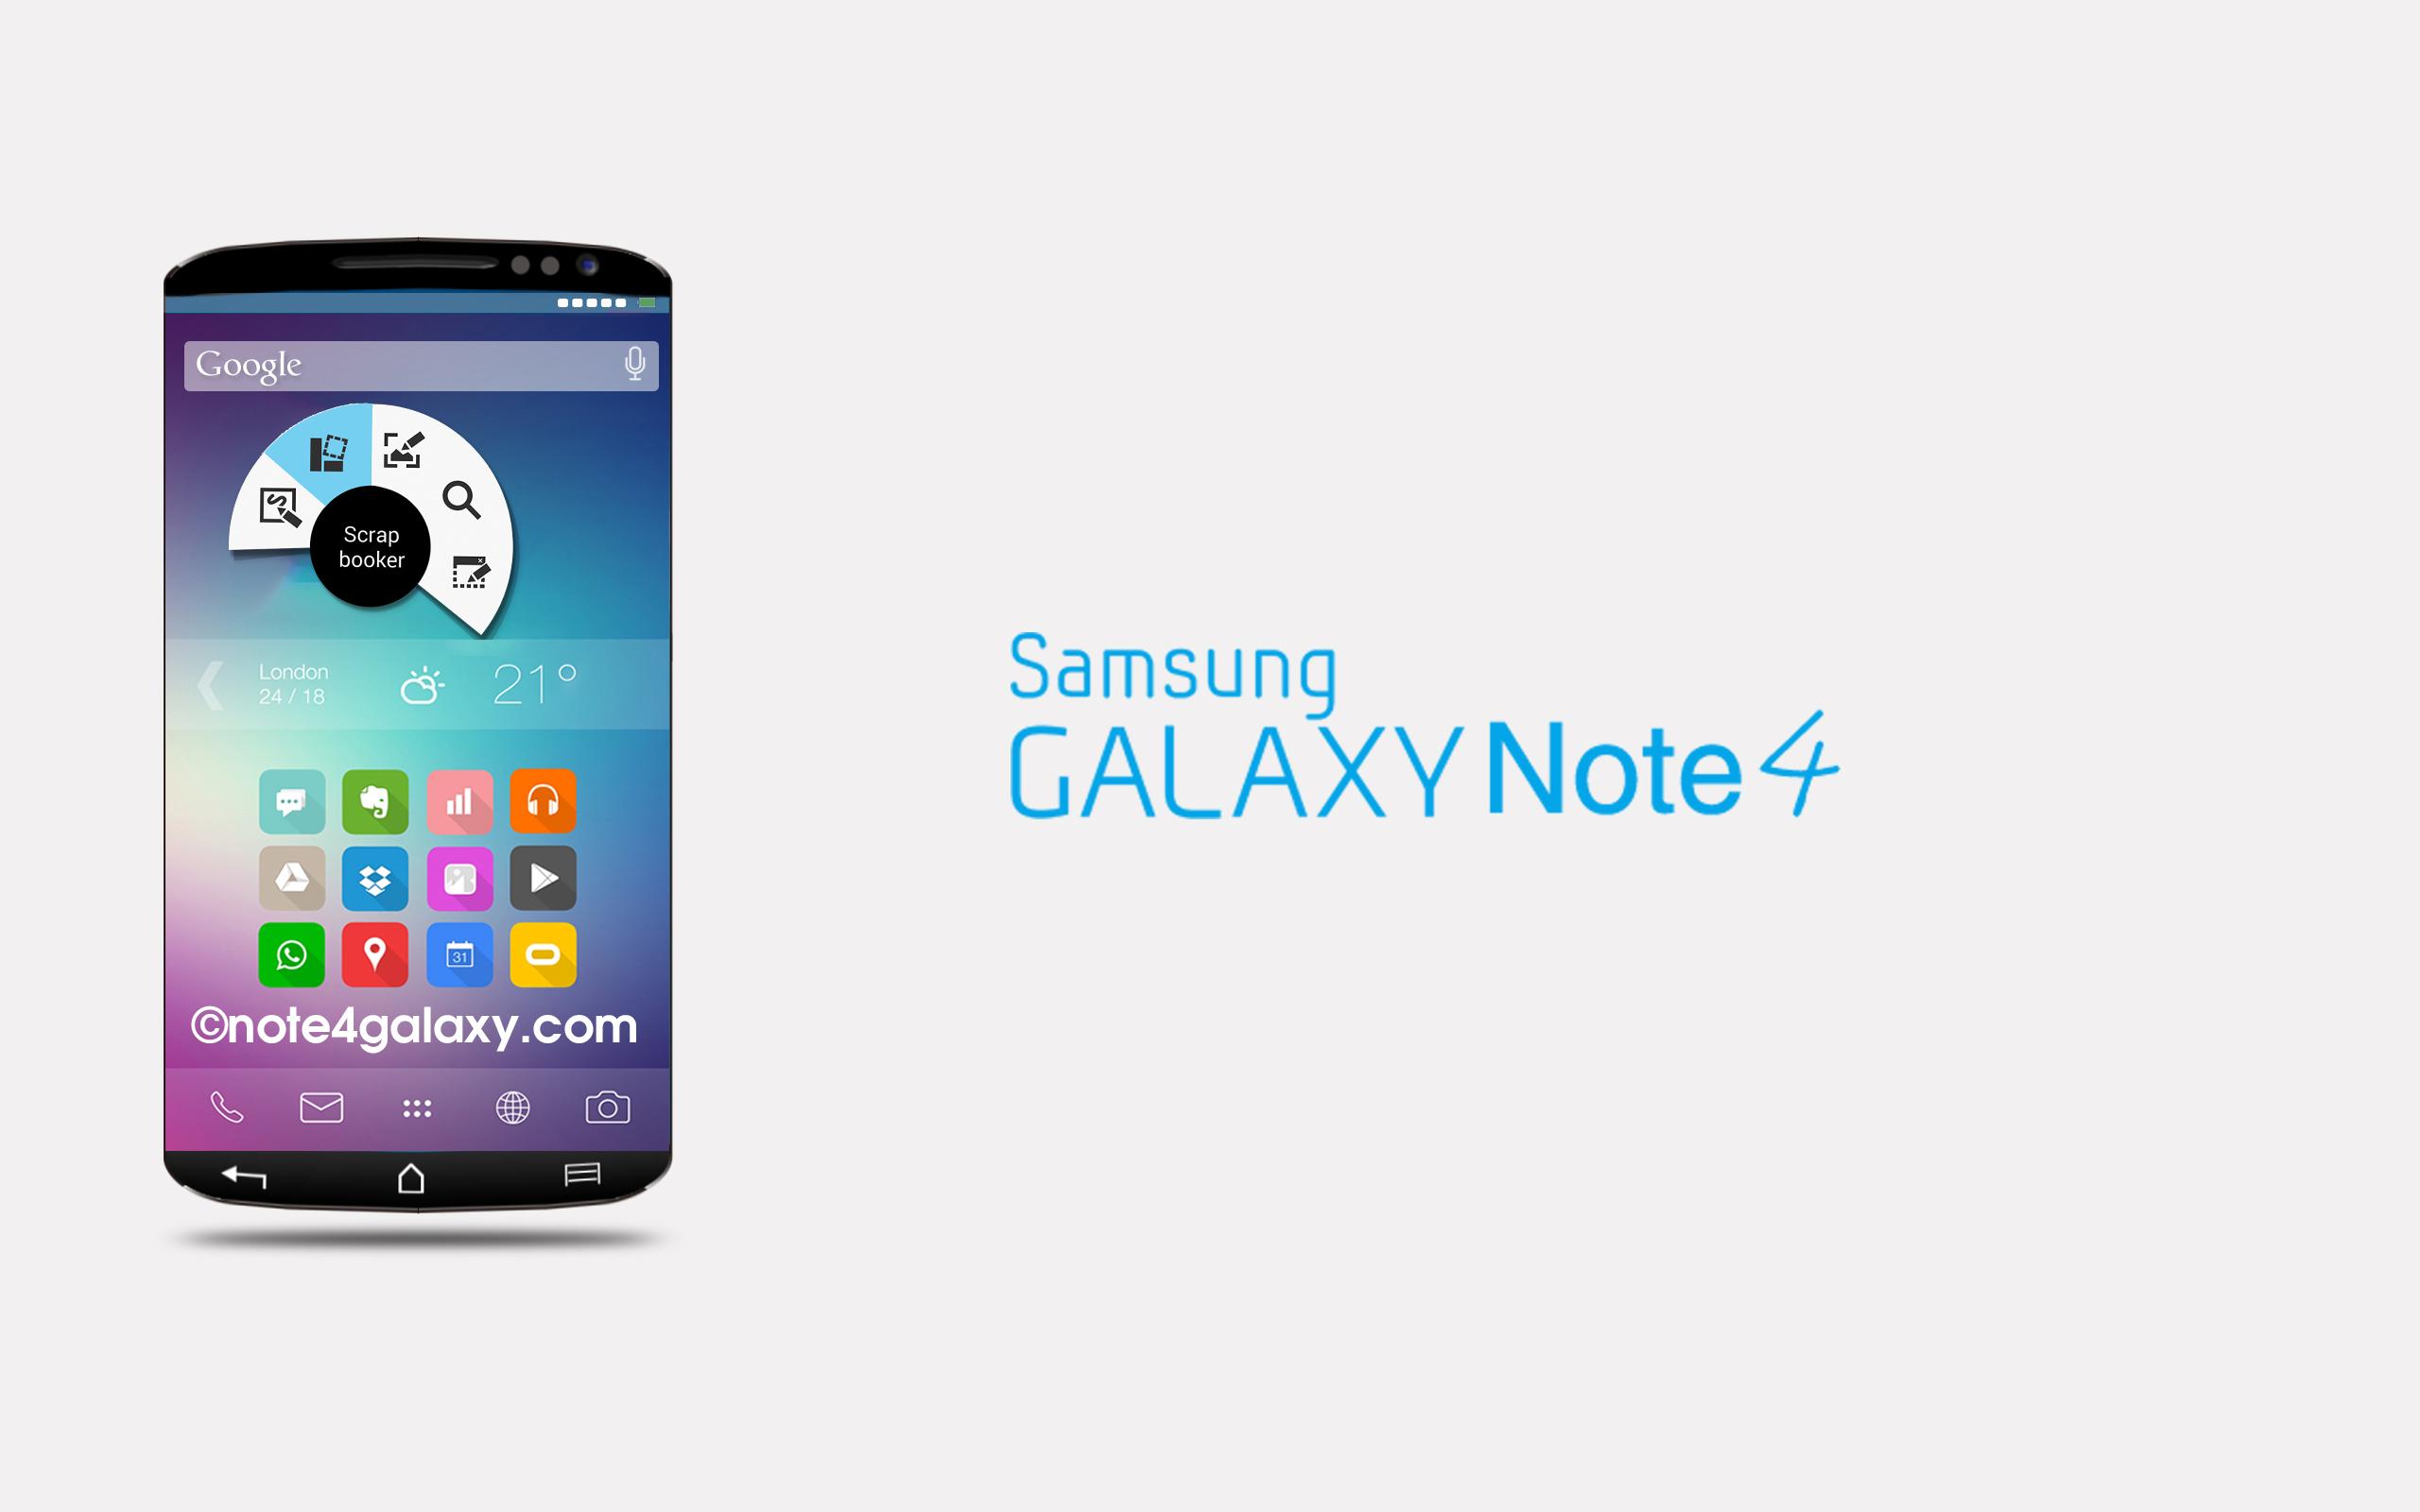 Galaxy note release date